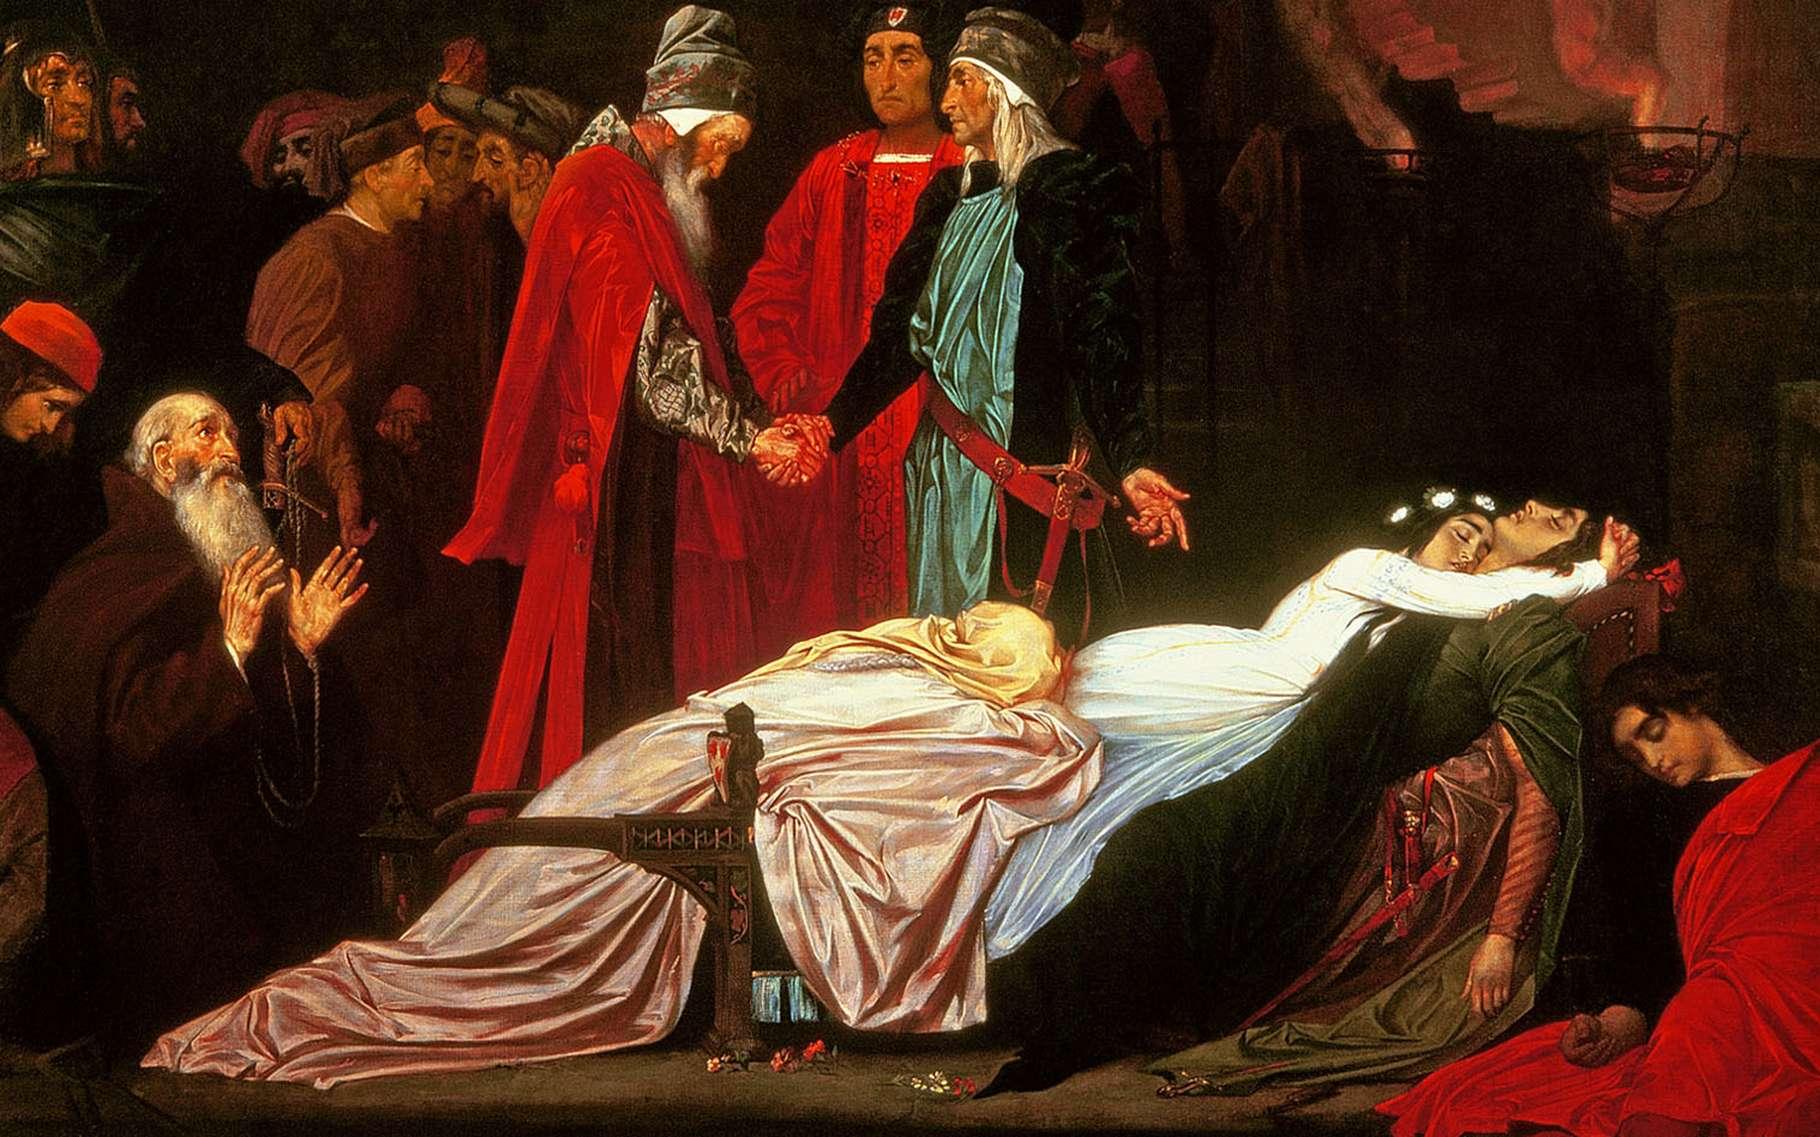 Roméo et Juliette. © The Bridgeman Art Library, Wikimedia commons, DP